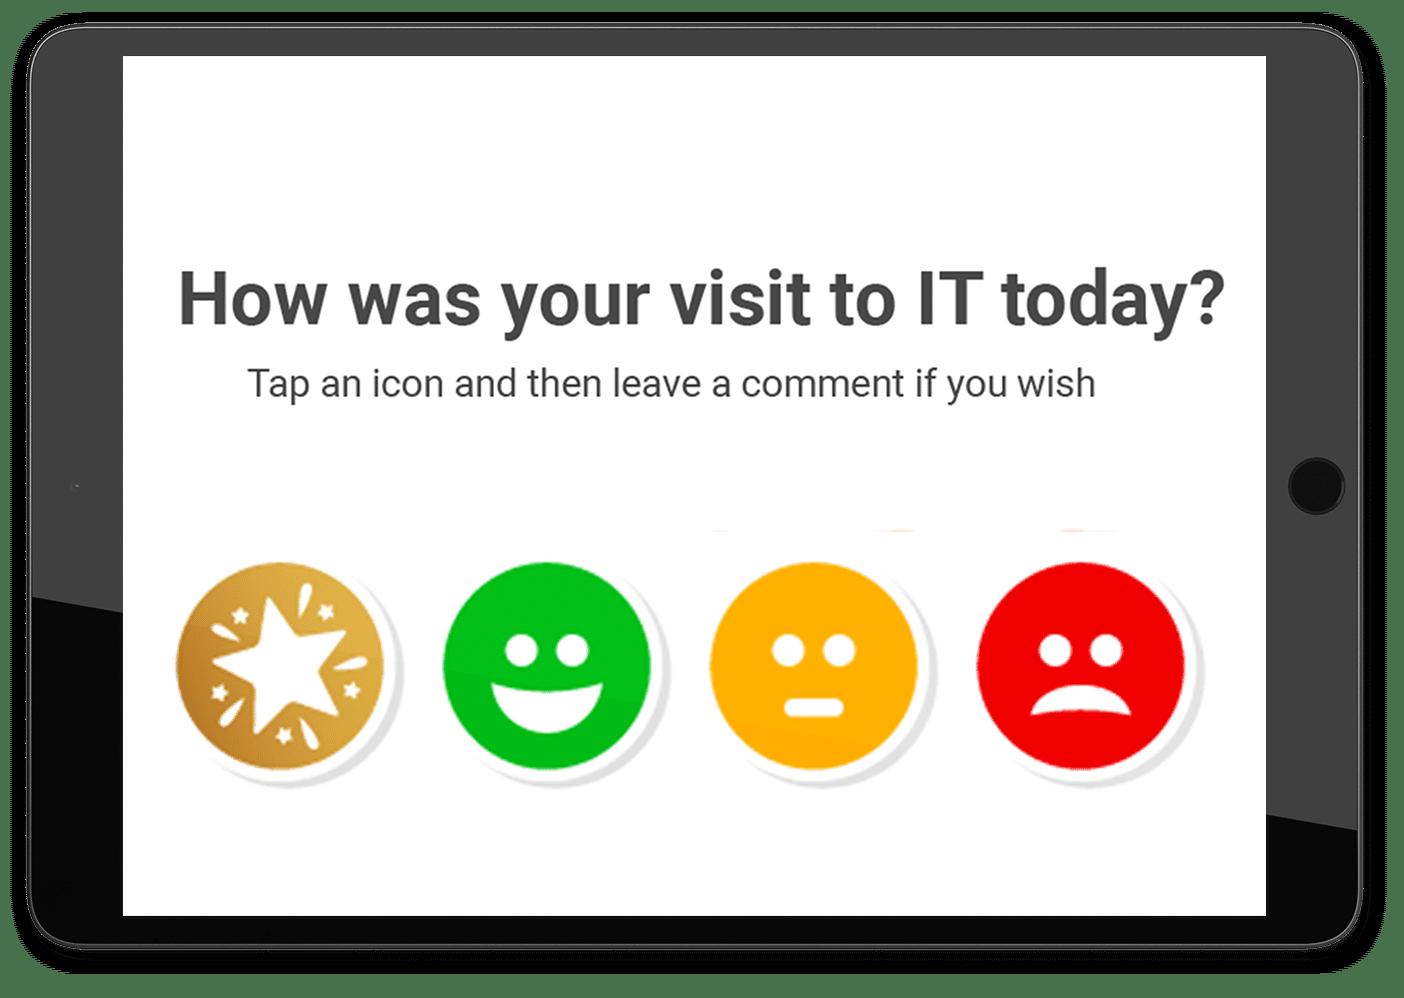 tablet ipad customer survey mock up ct